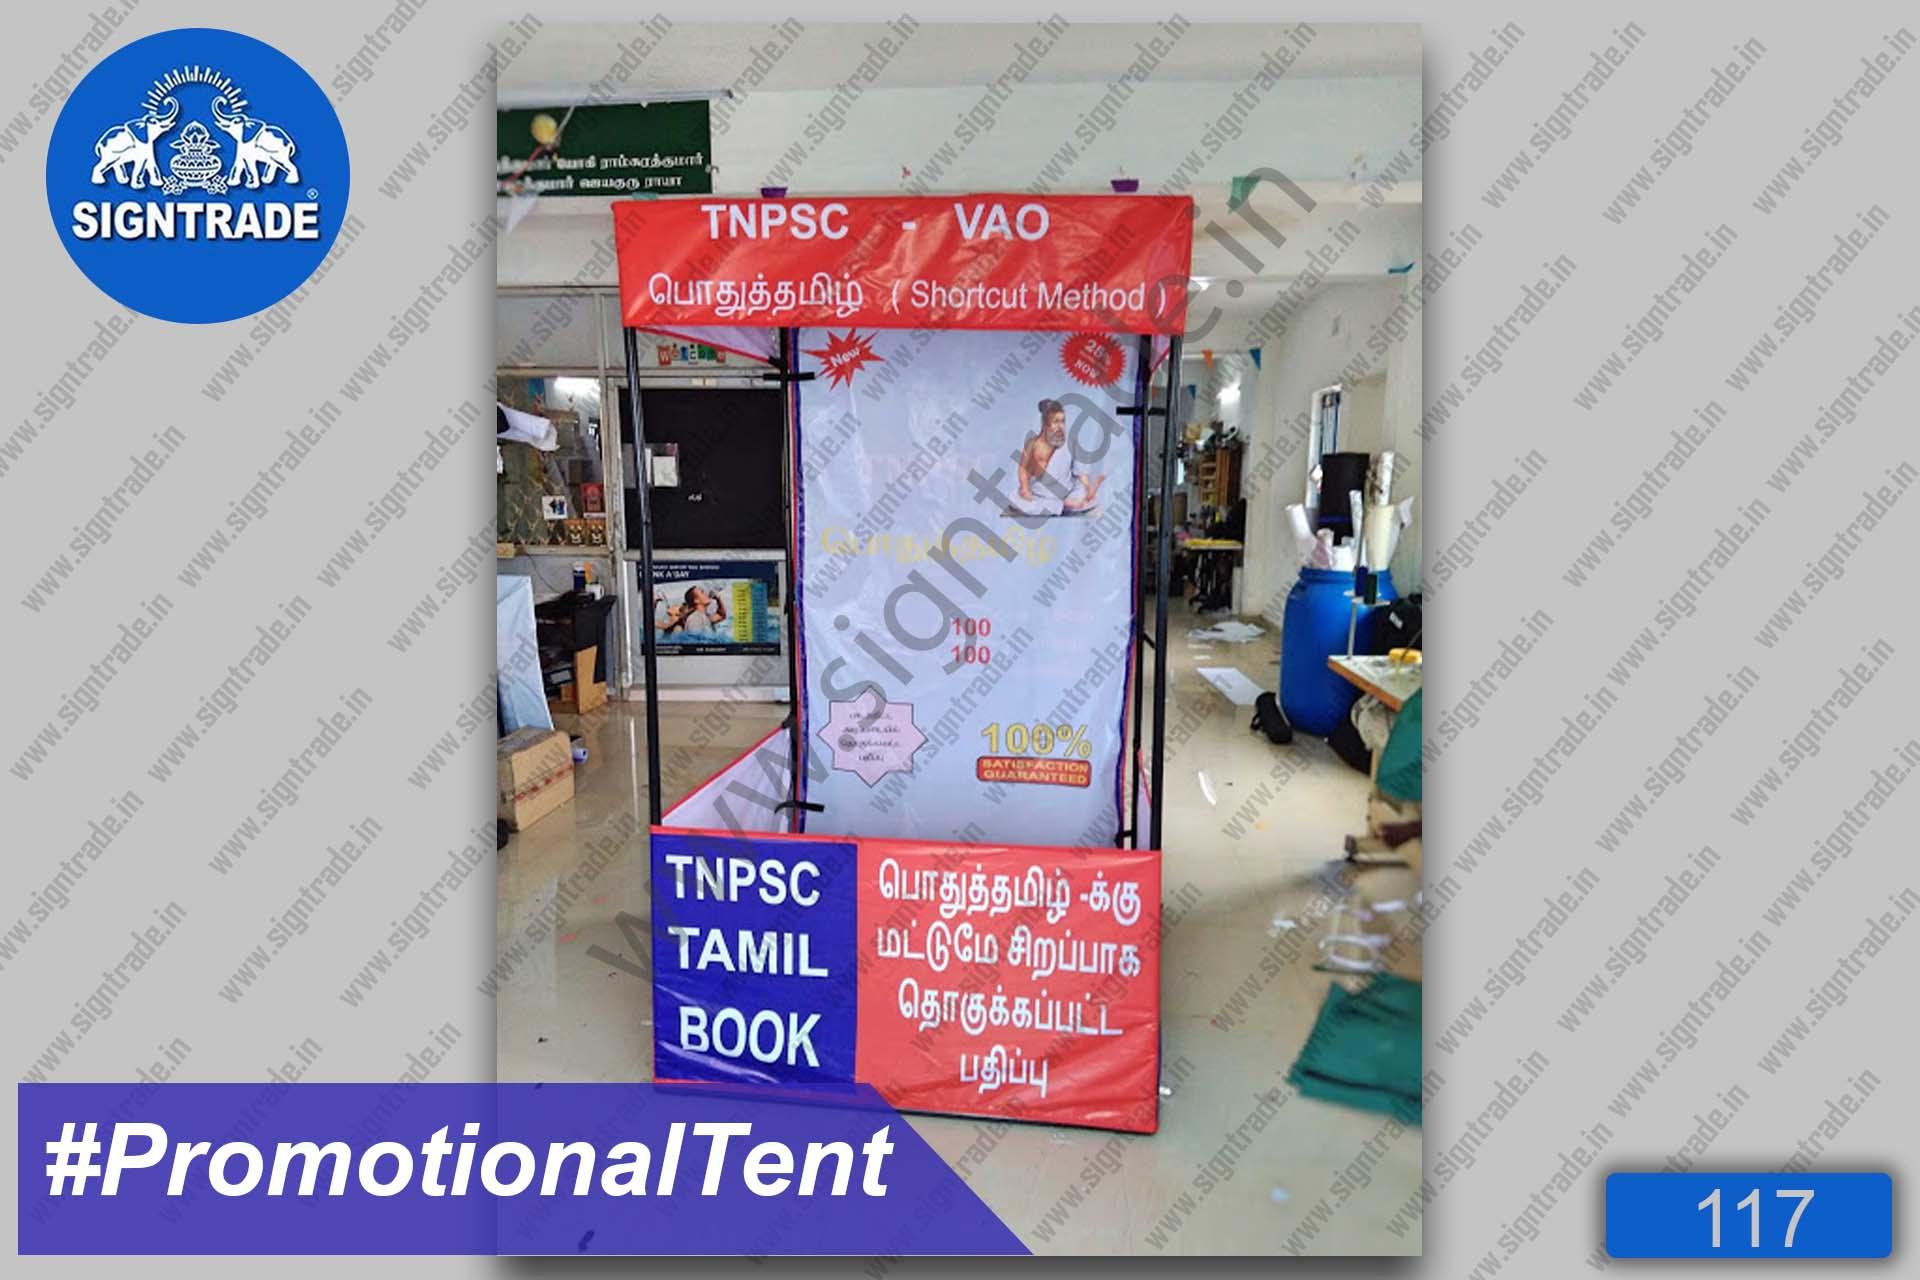 TNPSC Canopy Tent